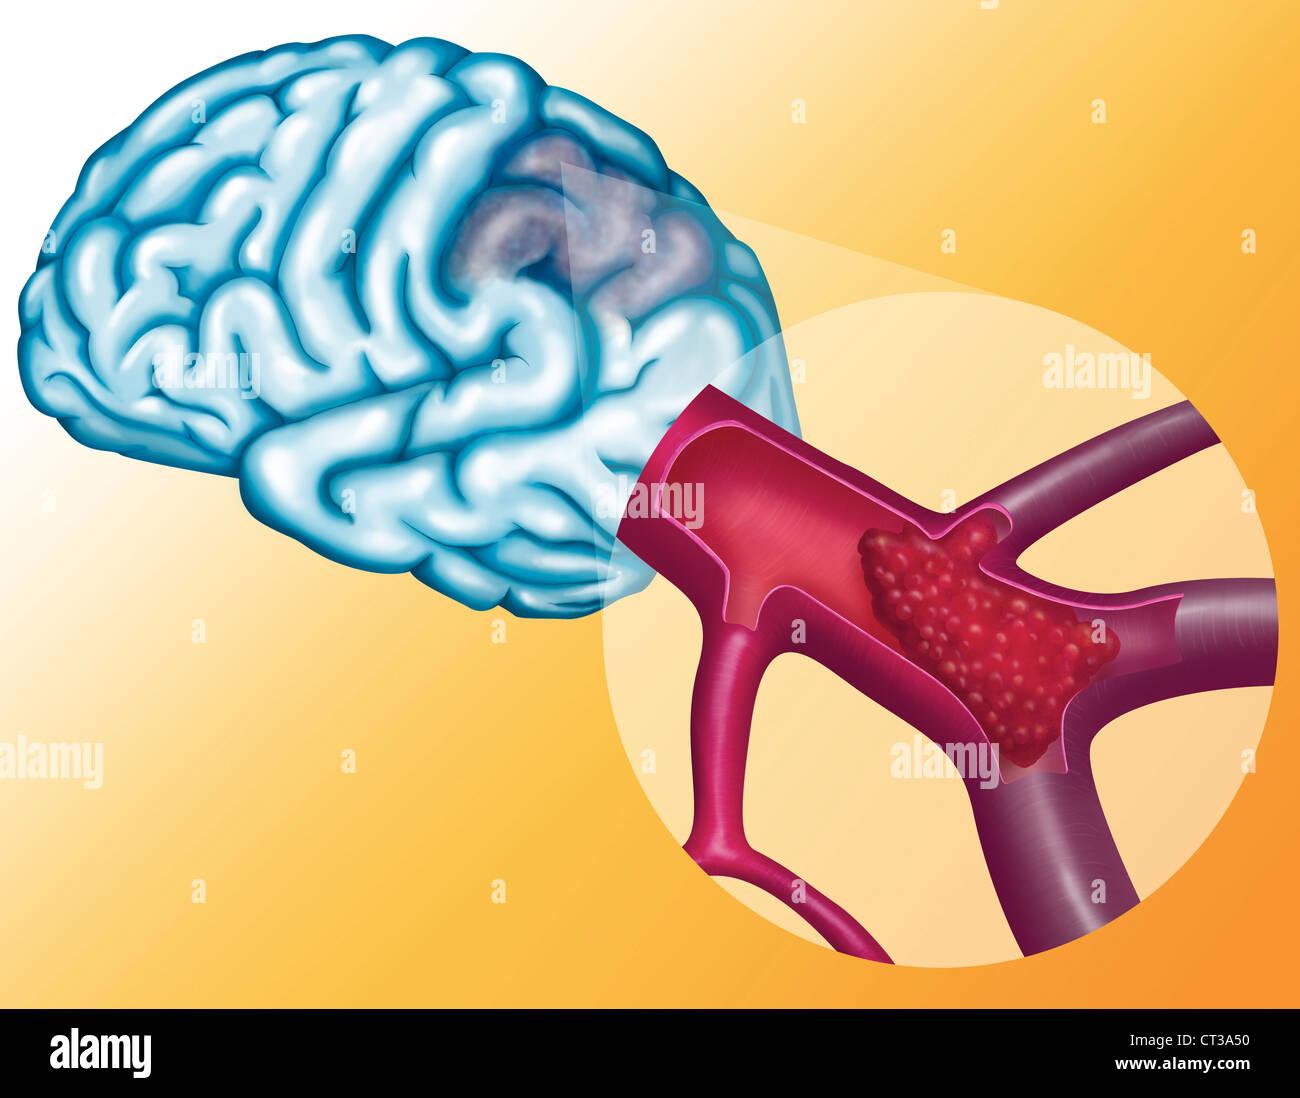 Arterial Thrombosis Stockfotos & Arterial Thrombosis Bilder - Alamy